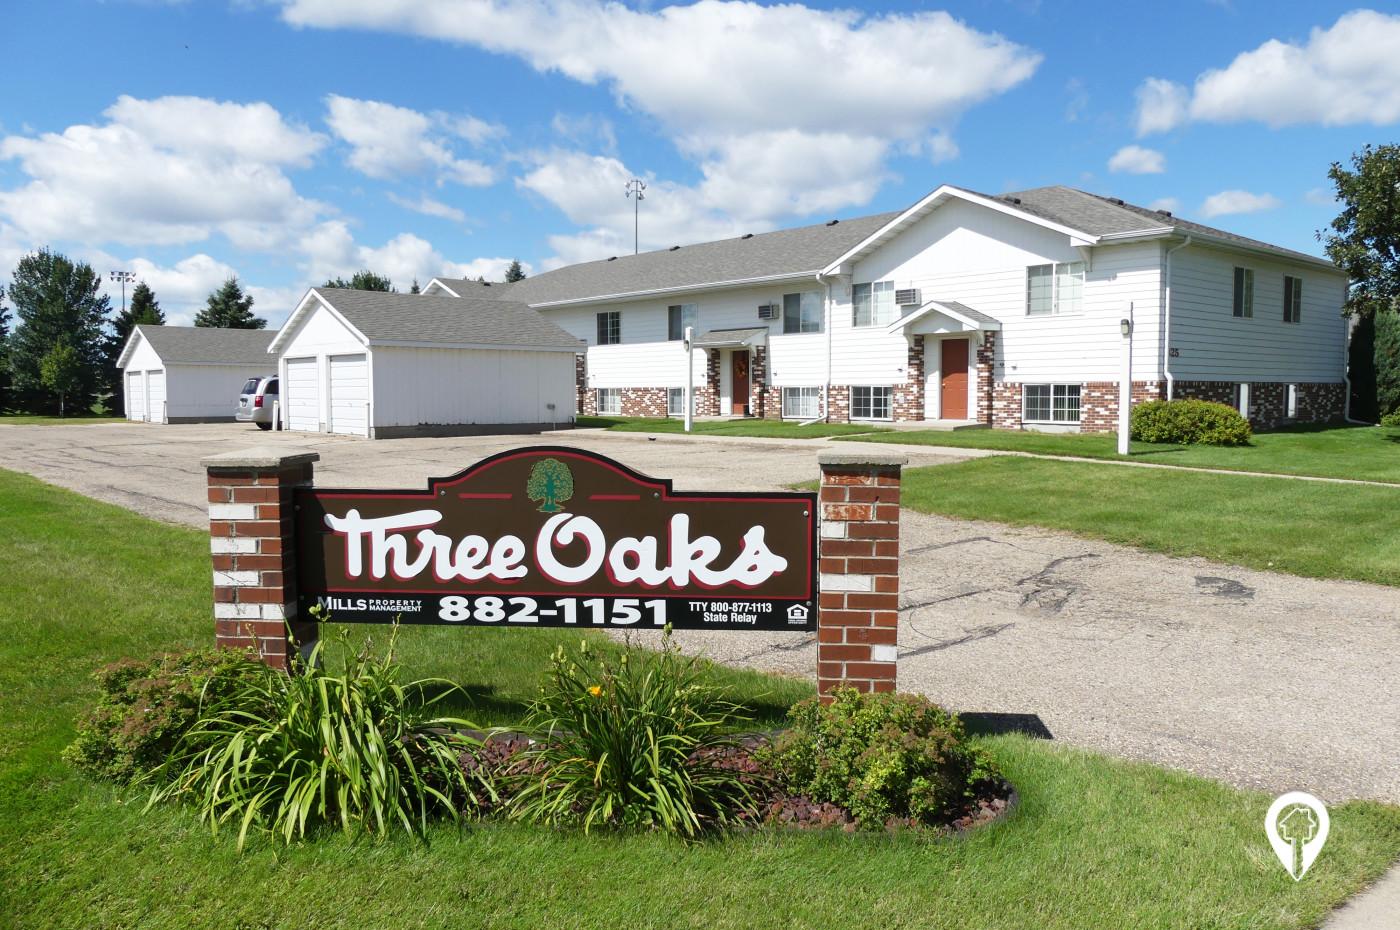 Three Oaks II Townhomes